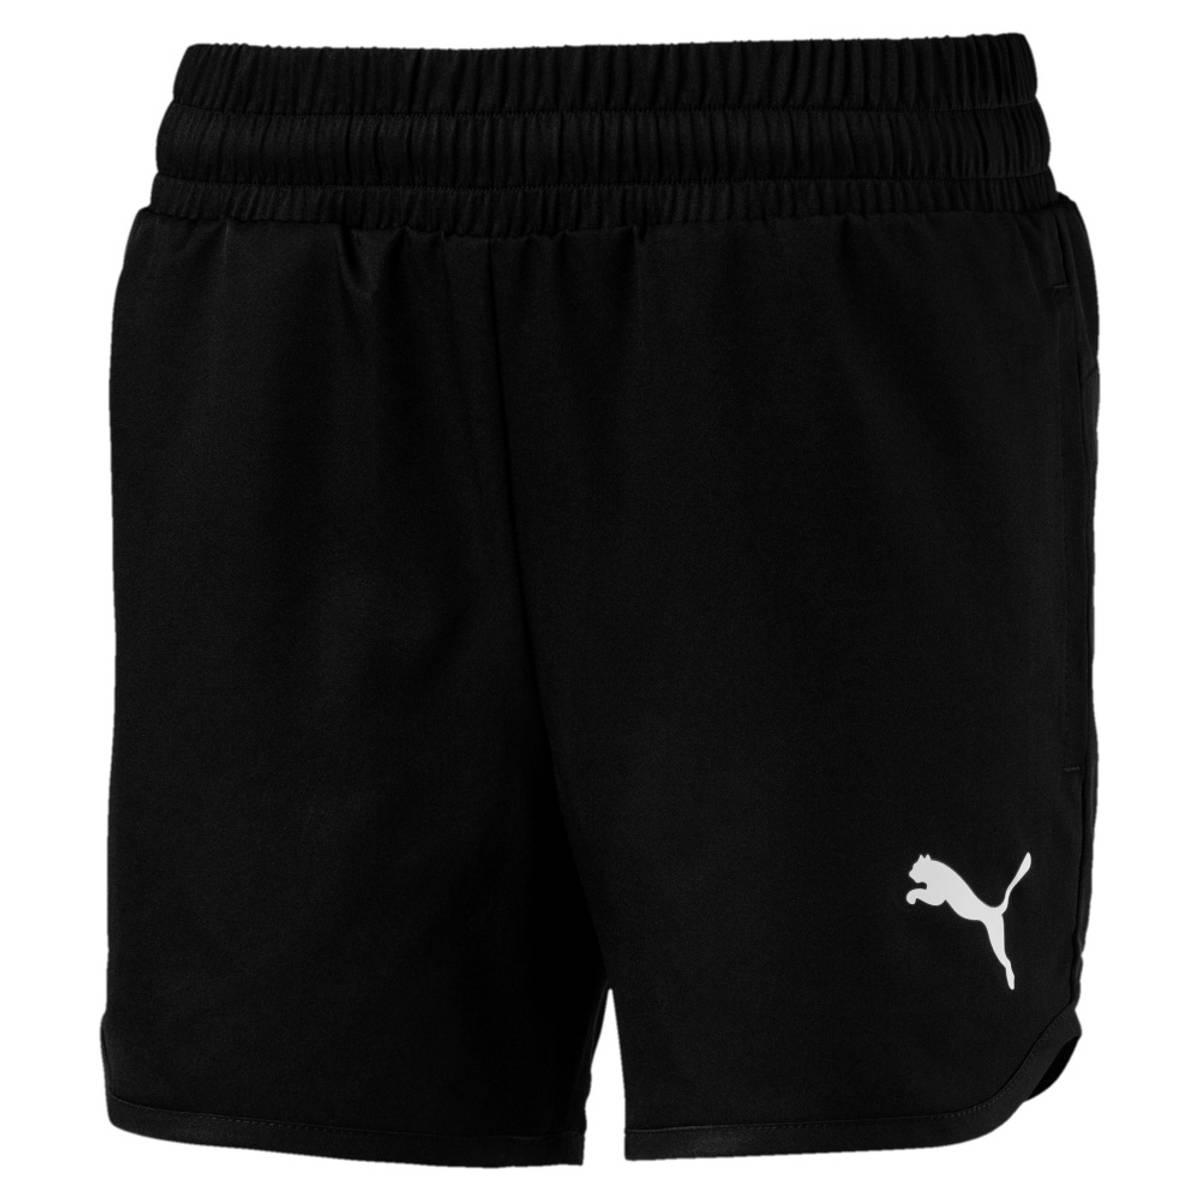 Sort Puma Active Girl Shorts